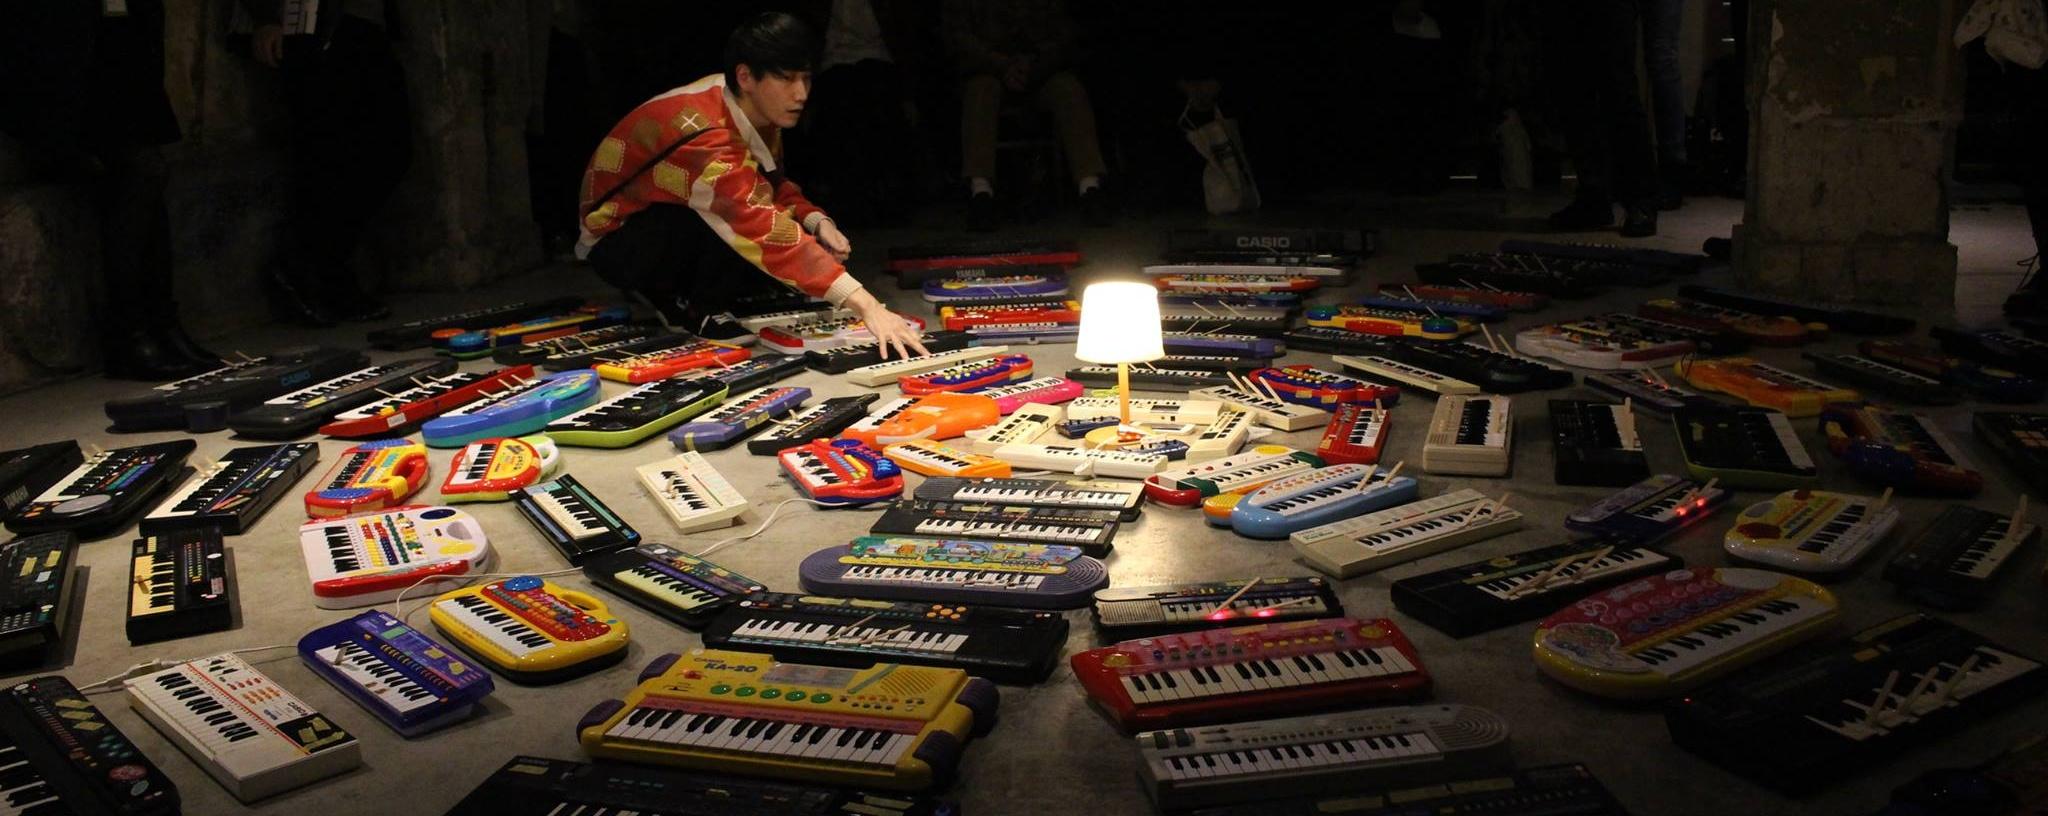 100 Keyboards By ASUNA